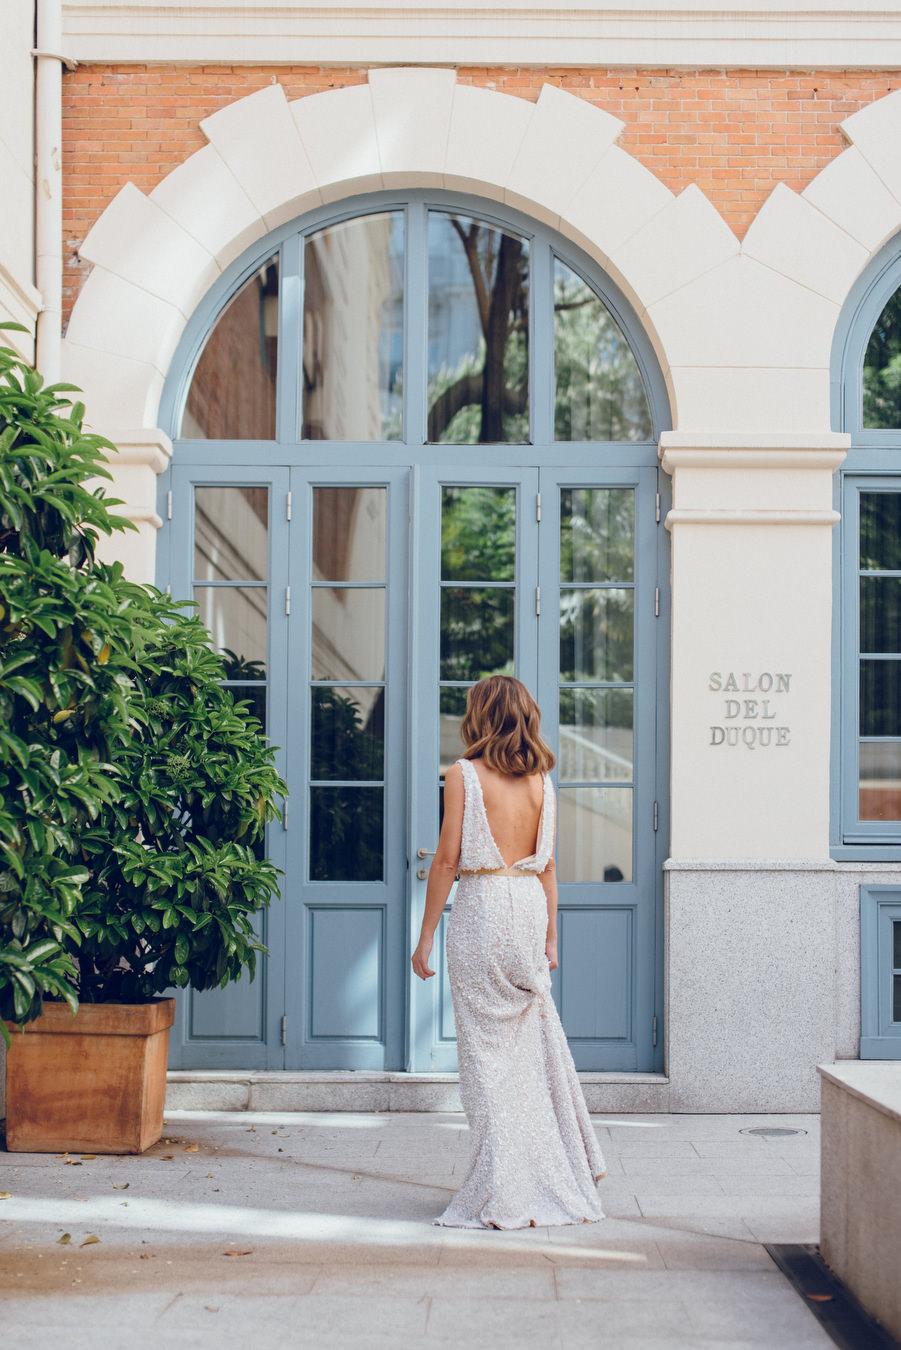 calista-one-lista-de-bodas-online-blog-de-bodas-bossanova-looks-invitadas-pepe-botella-2